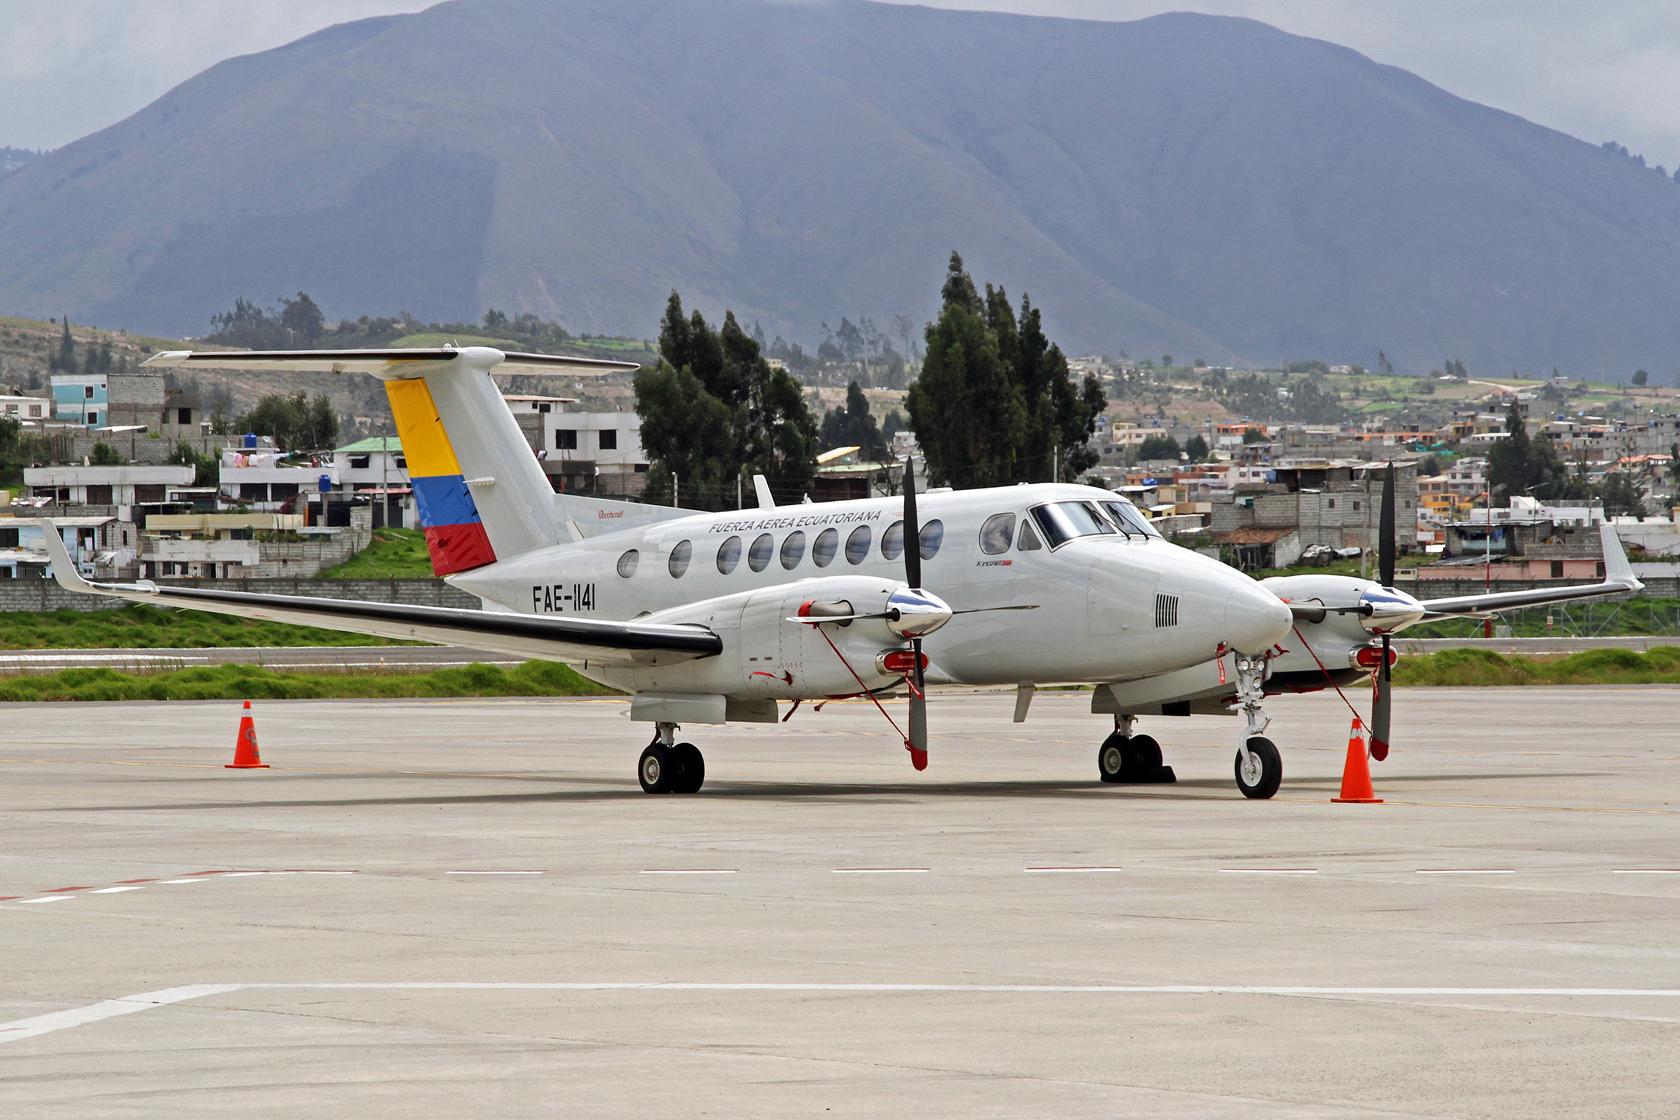 Fuerza Aérea Ecuatoriana Beechcraft King Air B350 FAE-1141